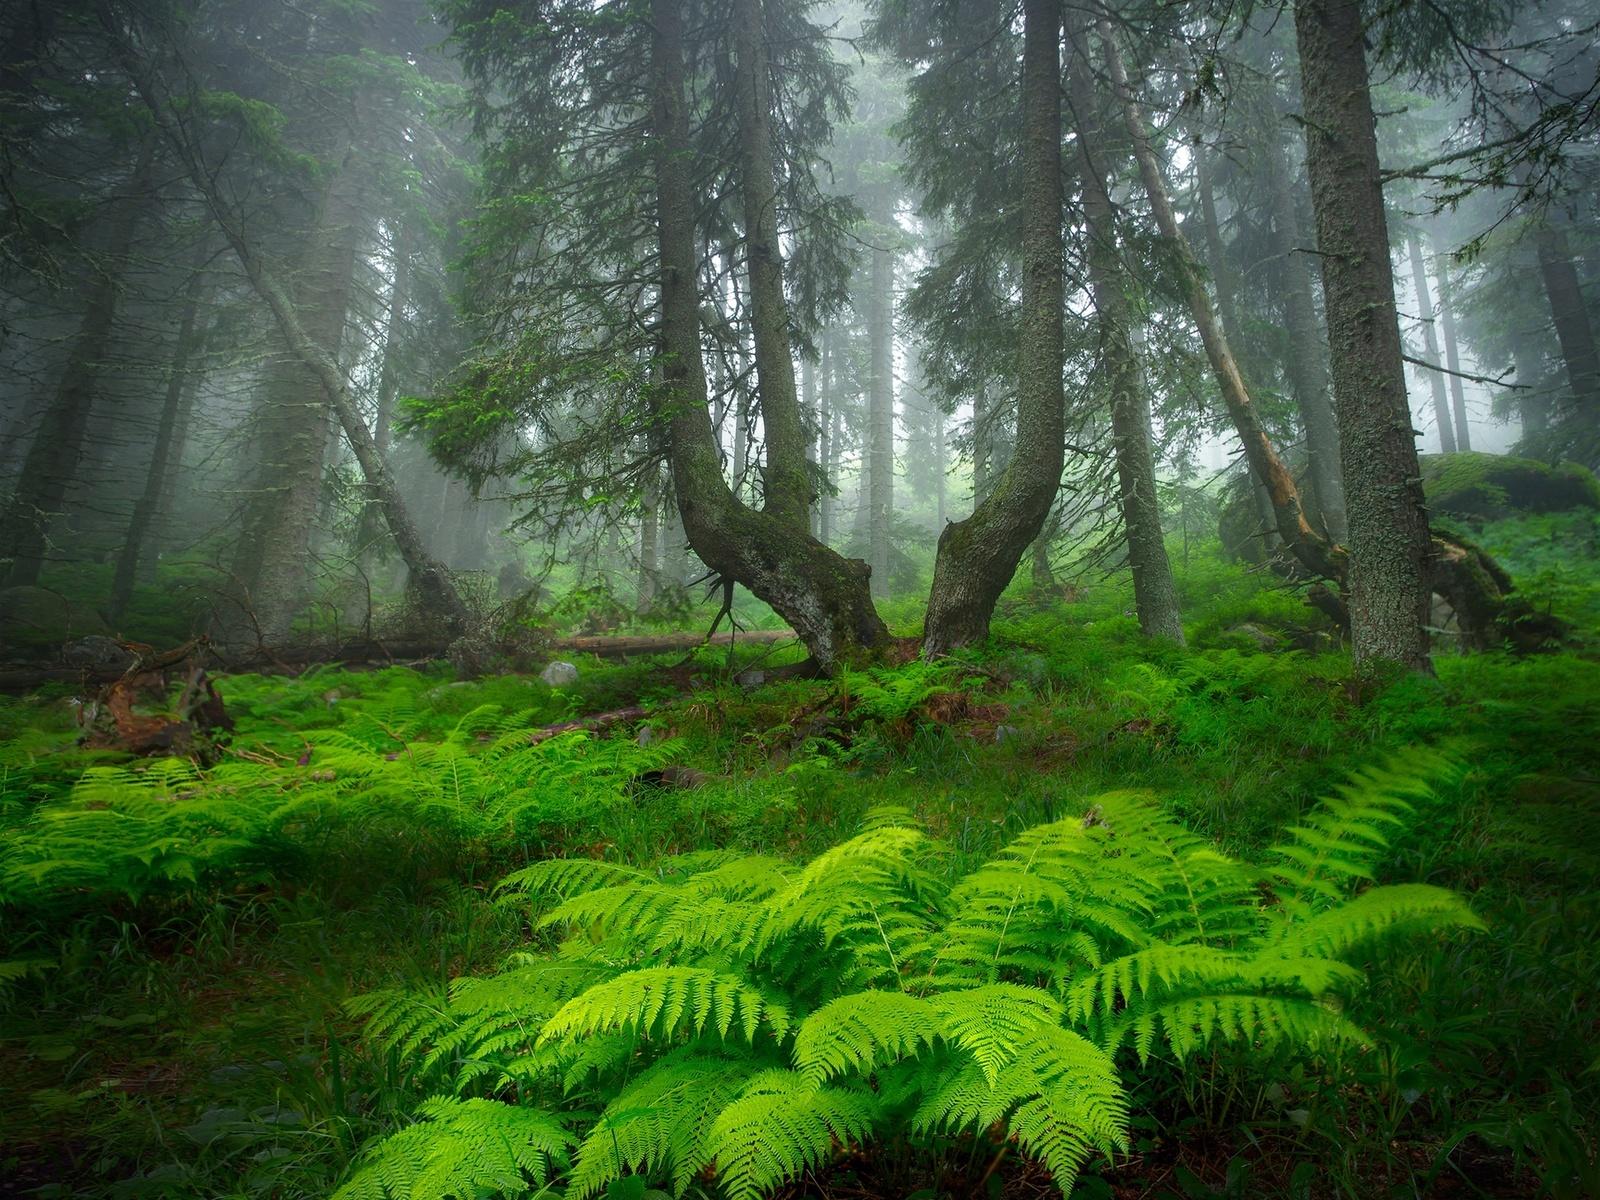 александров александър, супер фото, лес, папоротник